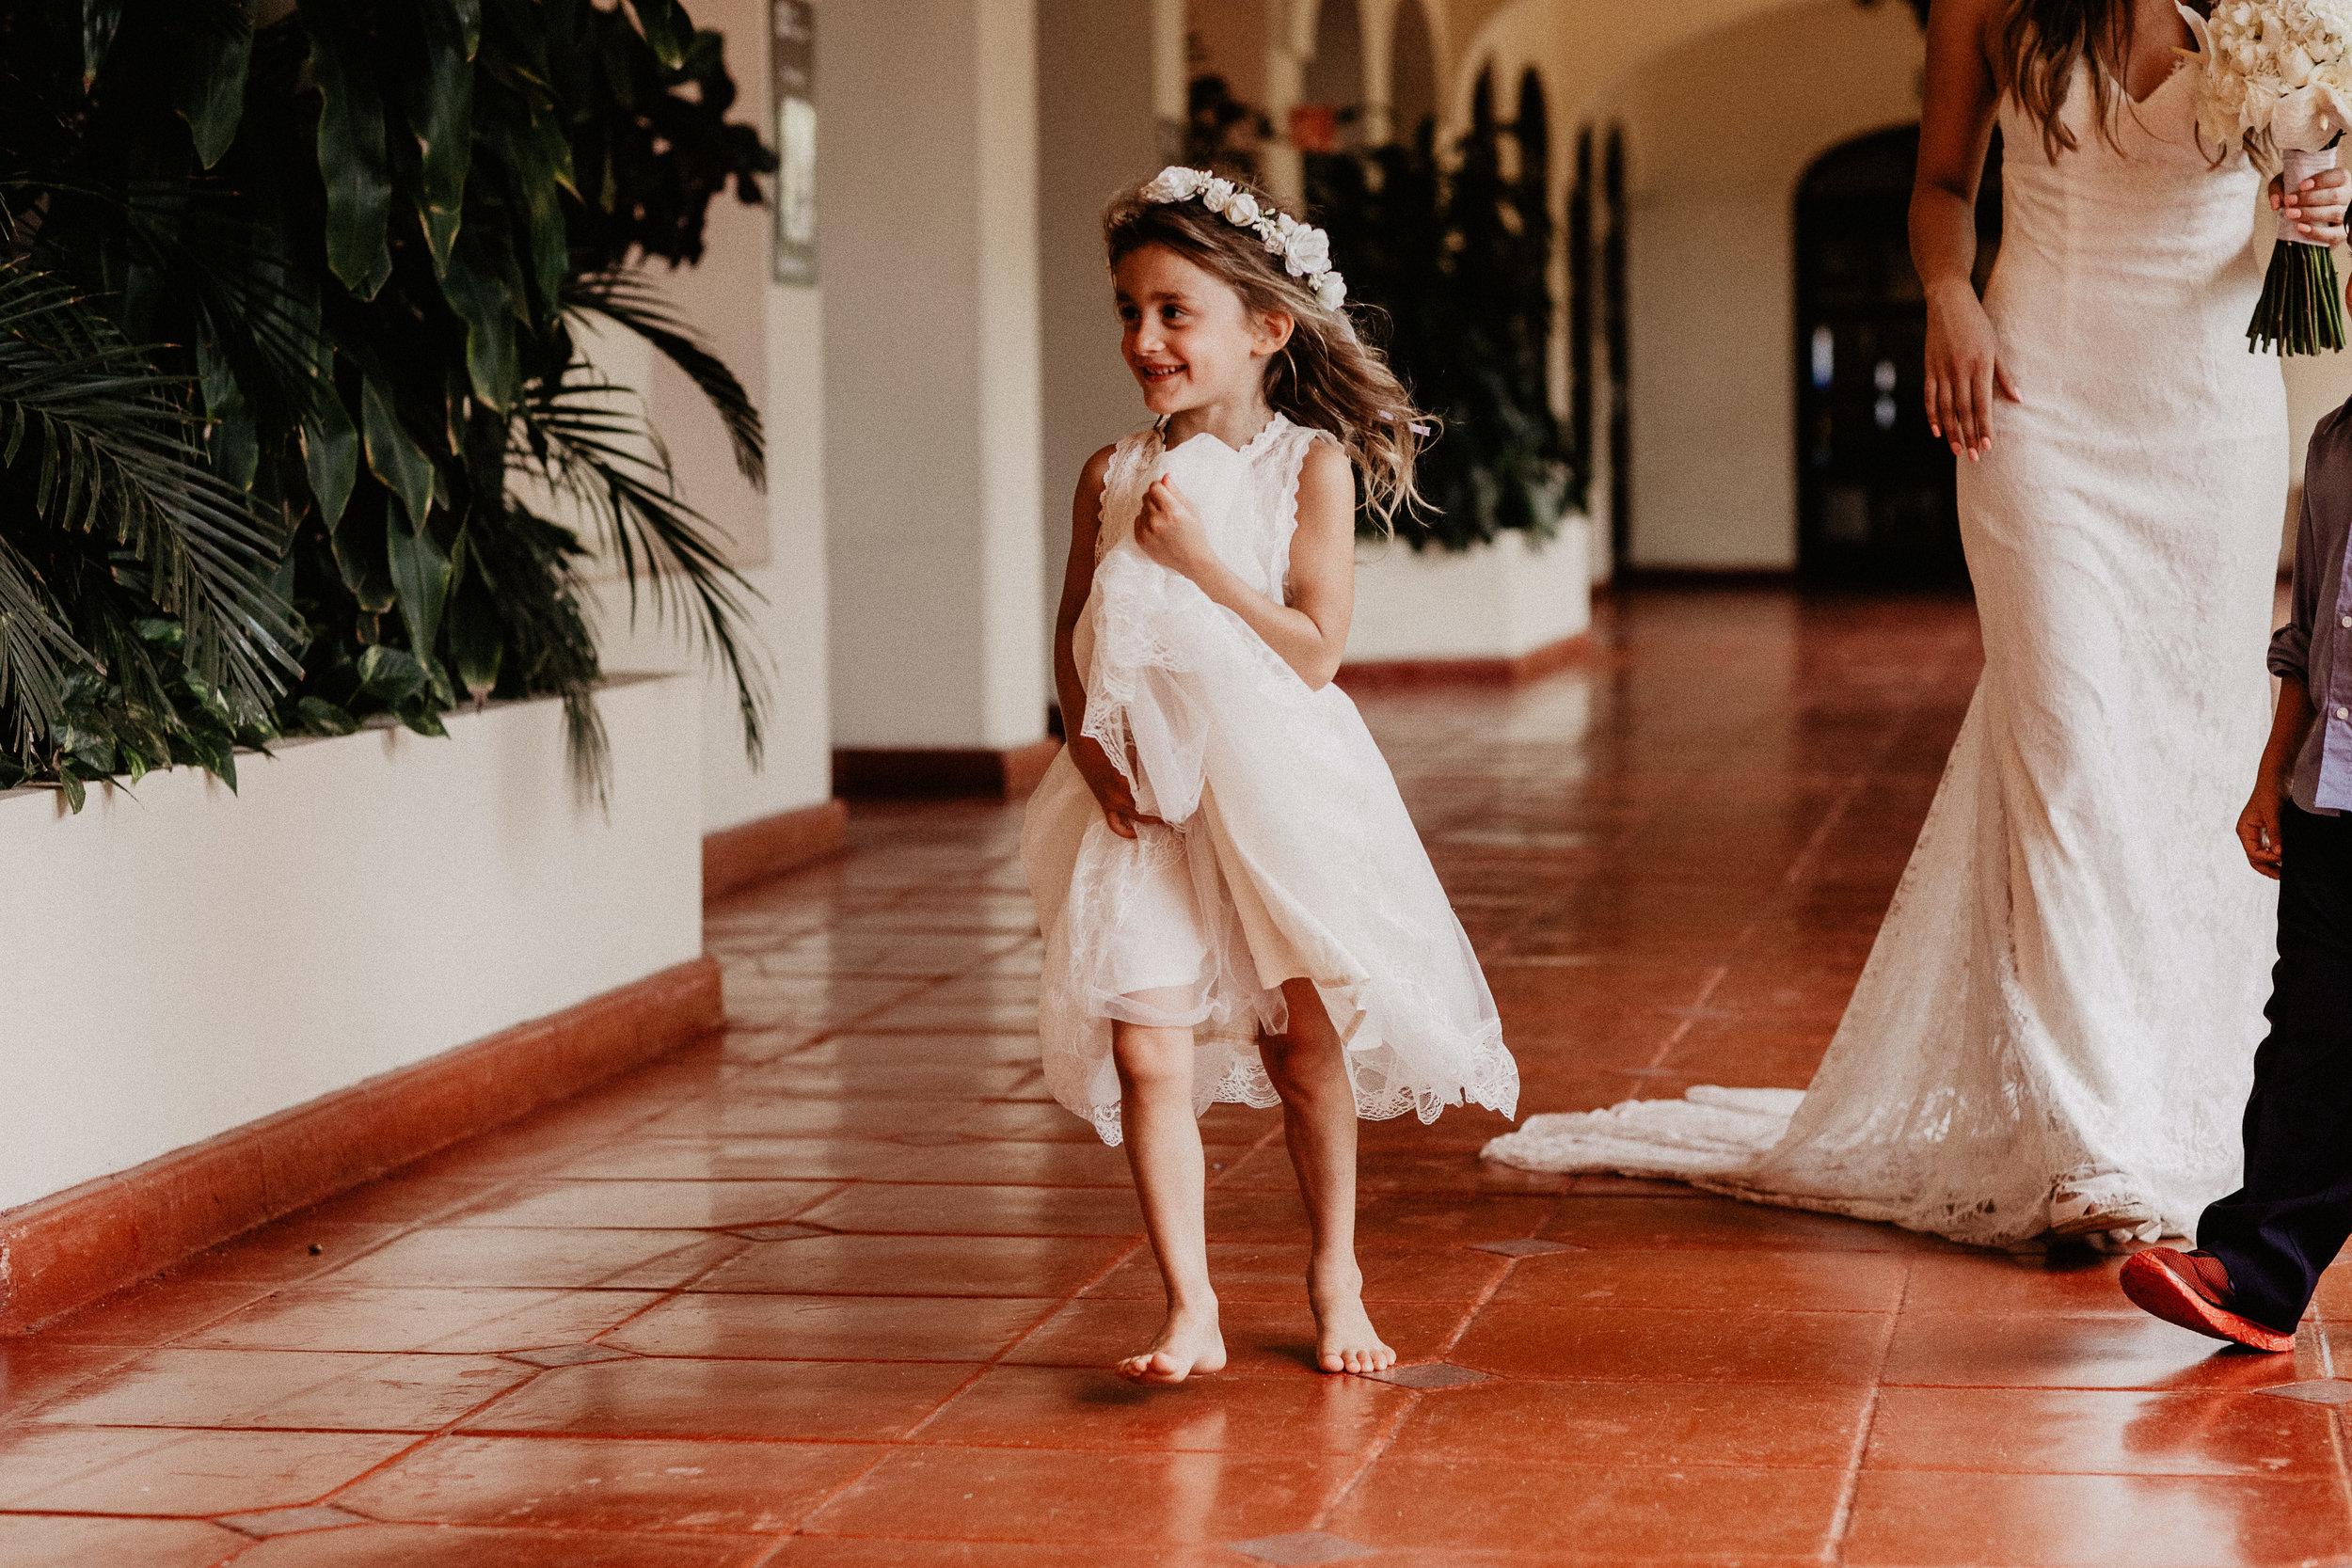 alfonso_flores_destination_wedding_photography_puerto_vallarta_hotel_barcelo_vallarta_cuttler_amela-394.JPG